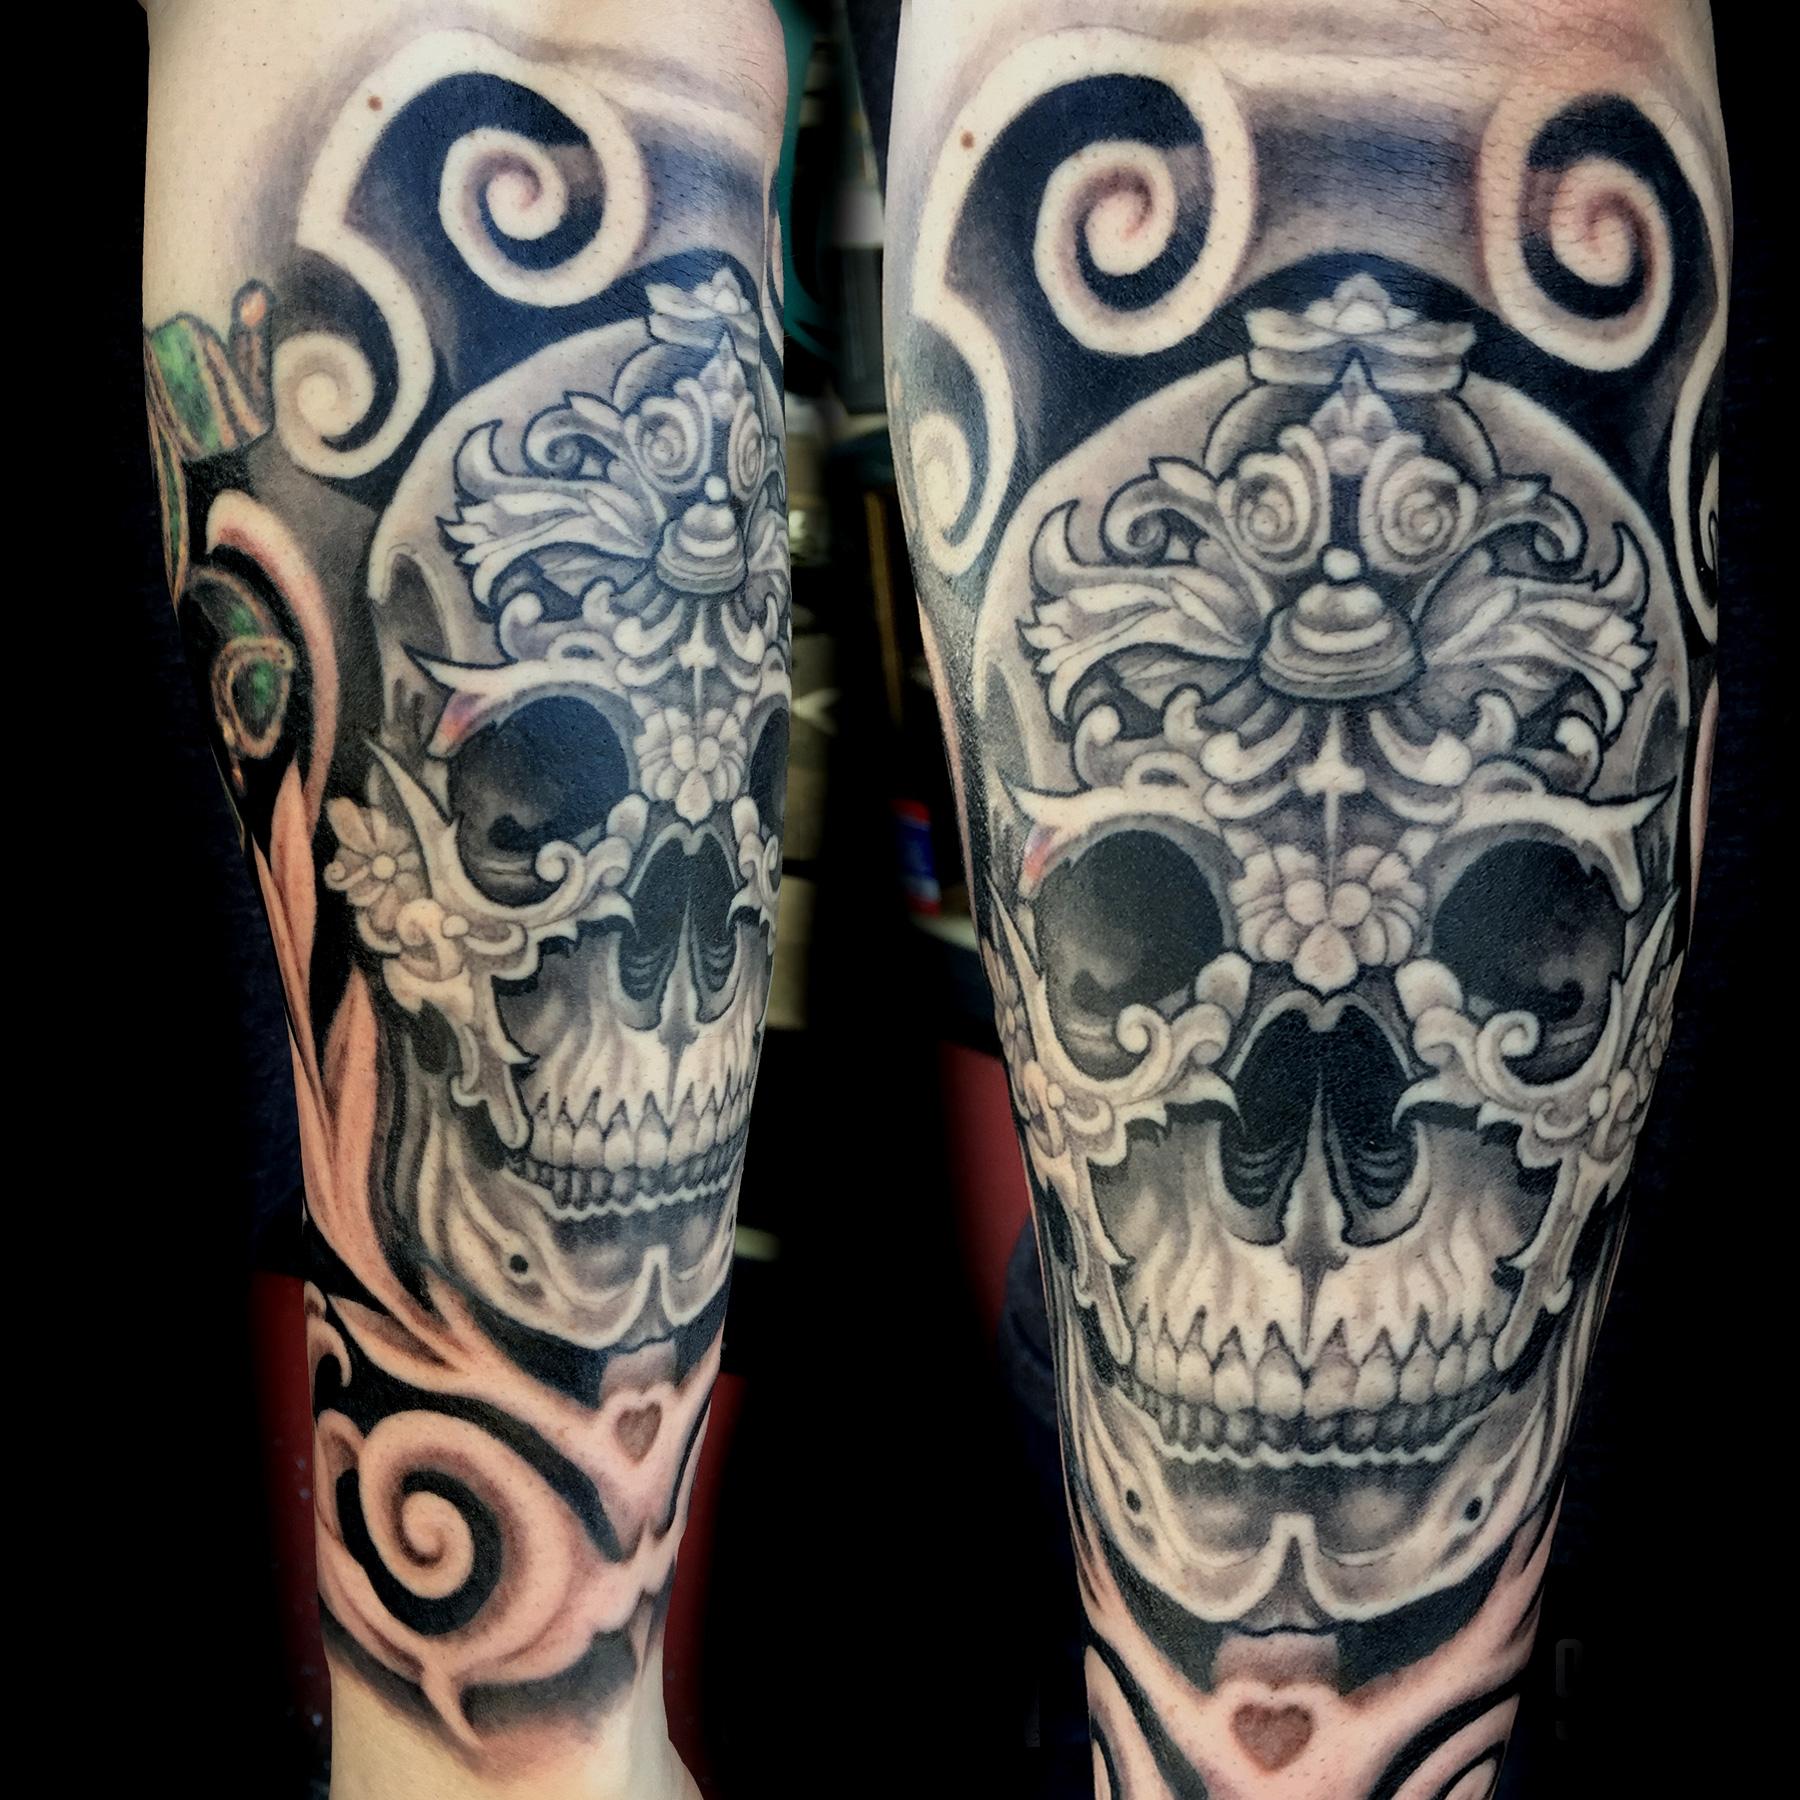 seans-skull.jpg